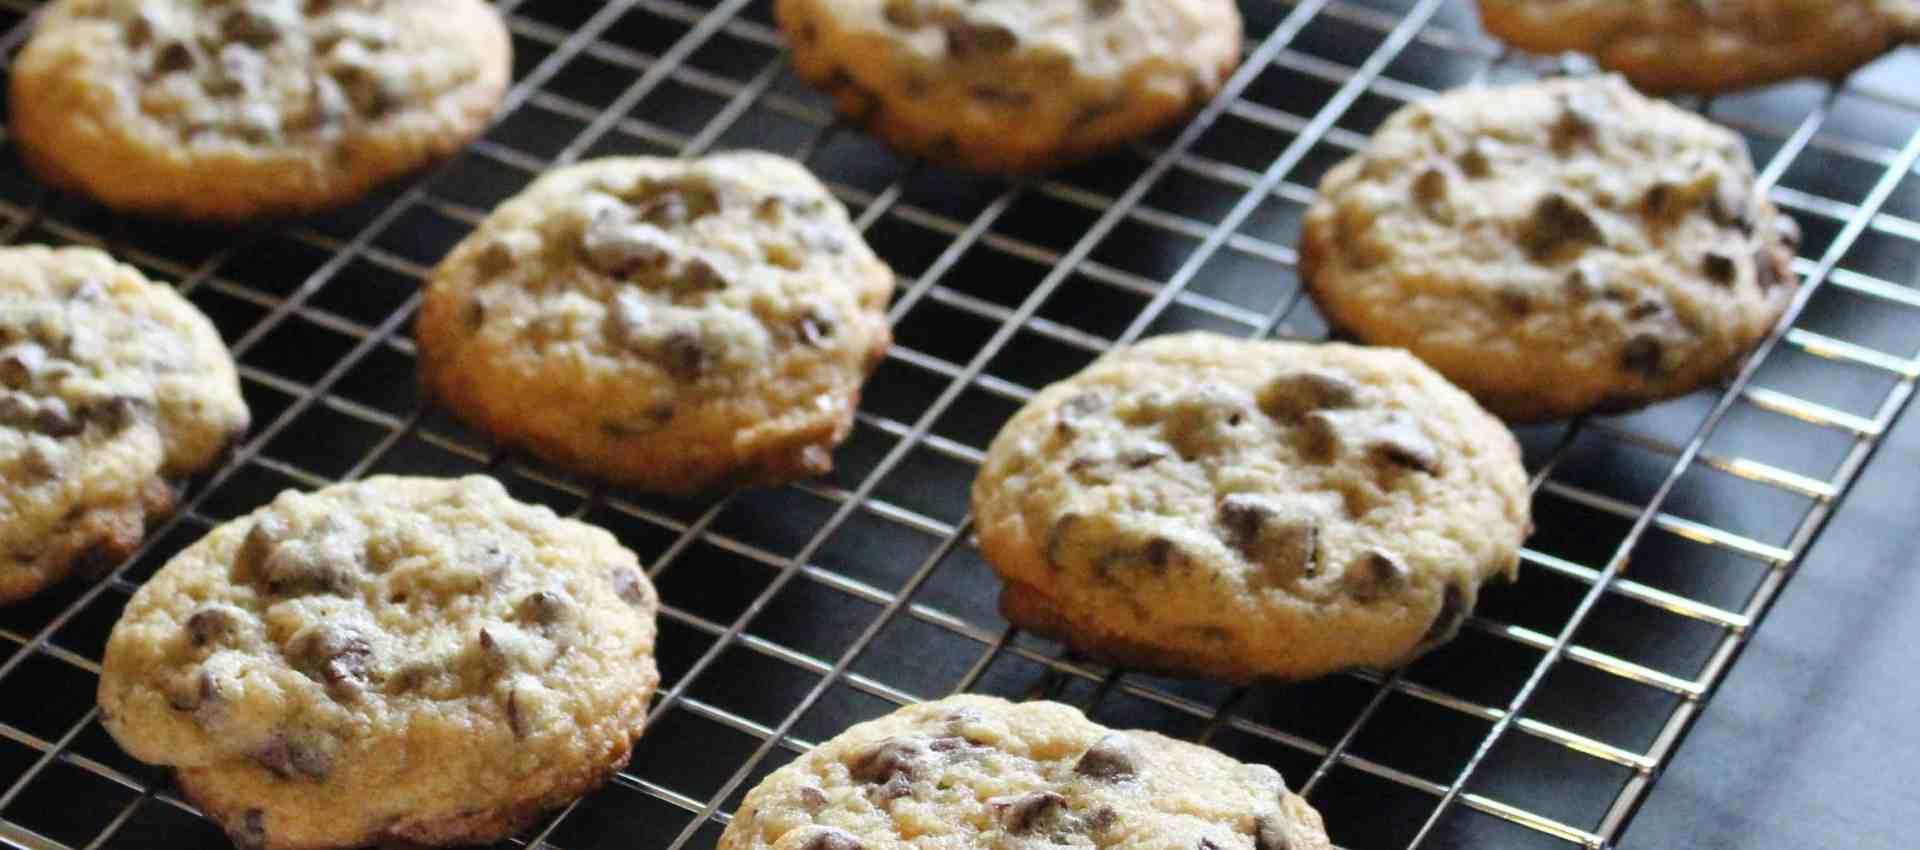 chocolate chip cookies, Amanda's Platge chocolate chip cookies, cookie recipe, chewy chocolate chip cookies, delicious chocolate chip cookies, cookie recipes